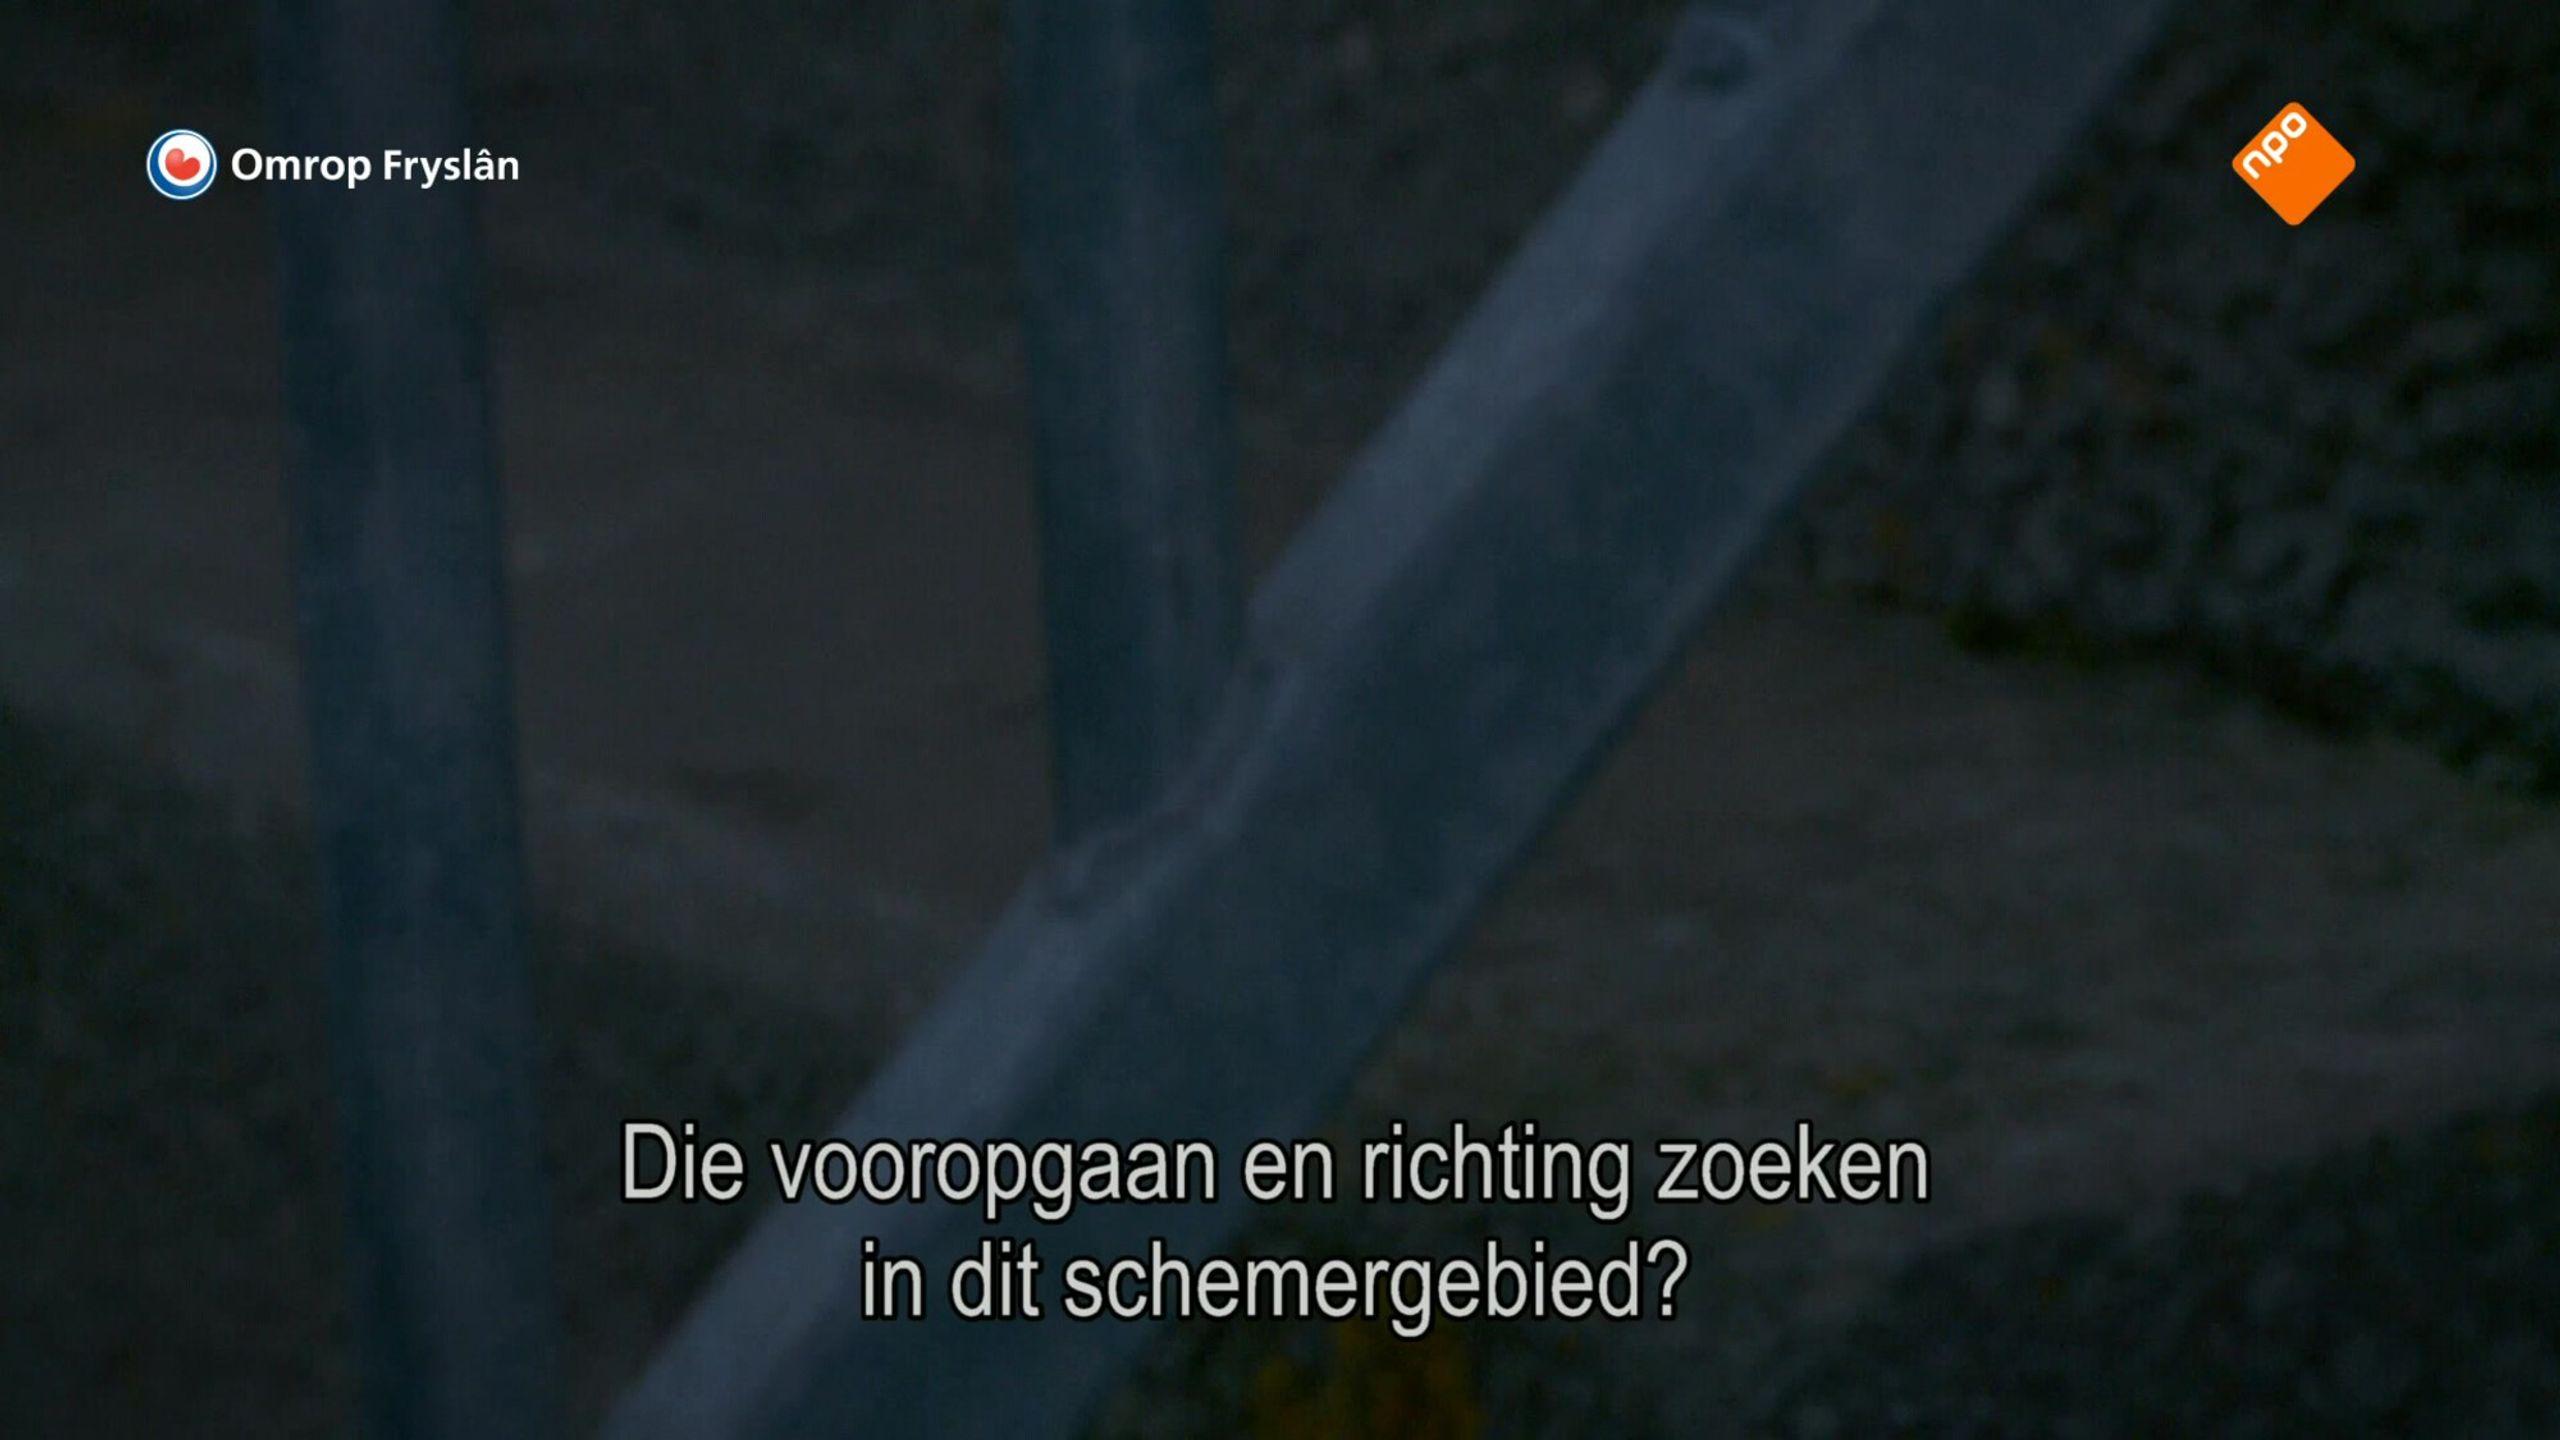 Fryslân dok